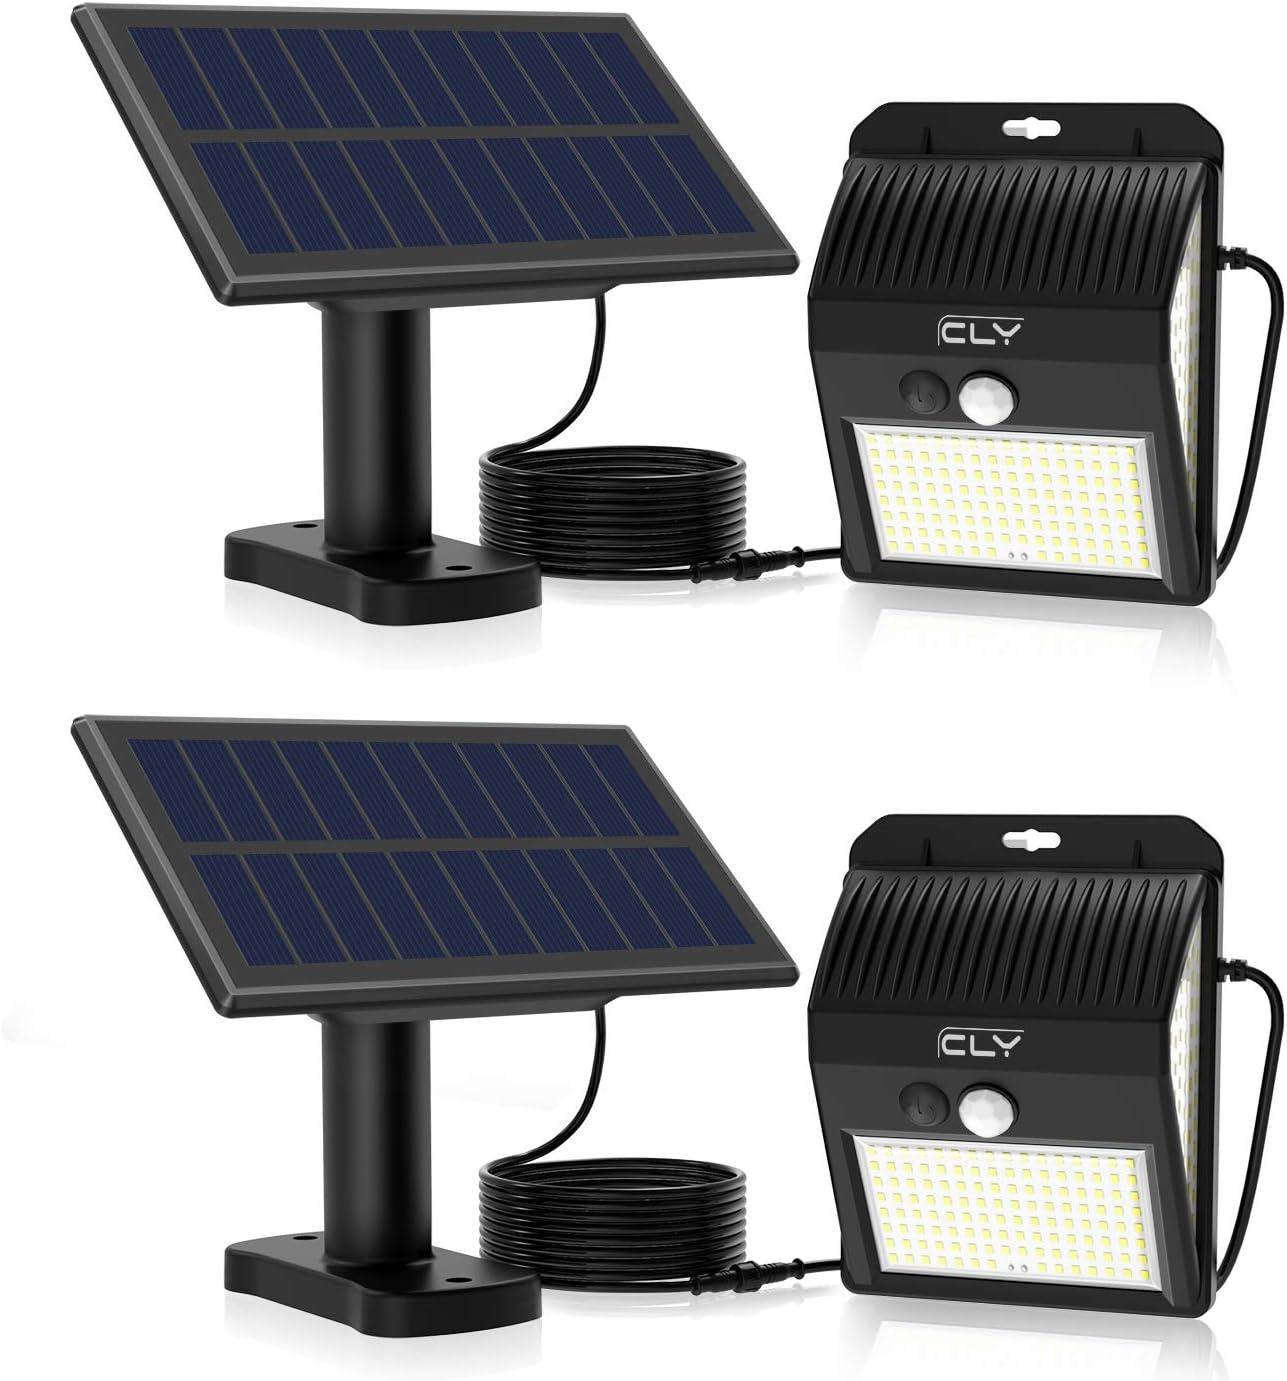 CLY Luces Solares LED Exterior Impermeable,Lámparas solares de pared con sensor de movimiento 6000K,extensión del cable de 3M, proyector para Jardín Muros Exteriore Patios Terrazas(2pcs)